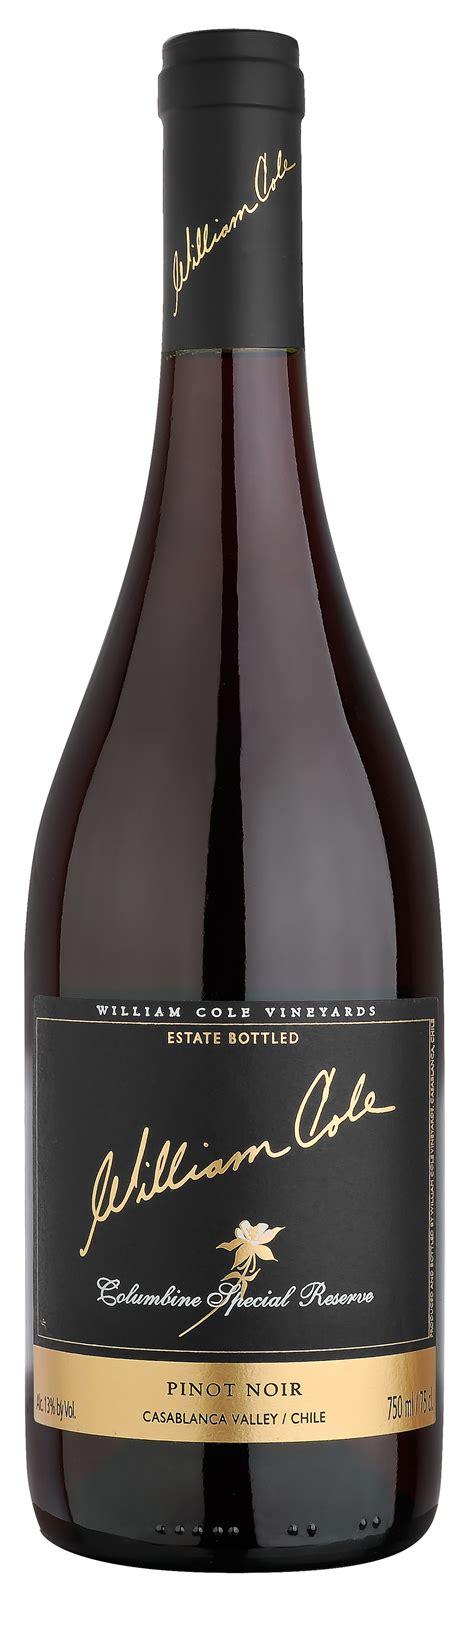 mirador columbine fotos botellas william cole vineyards